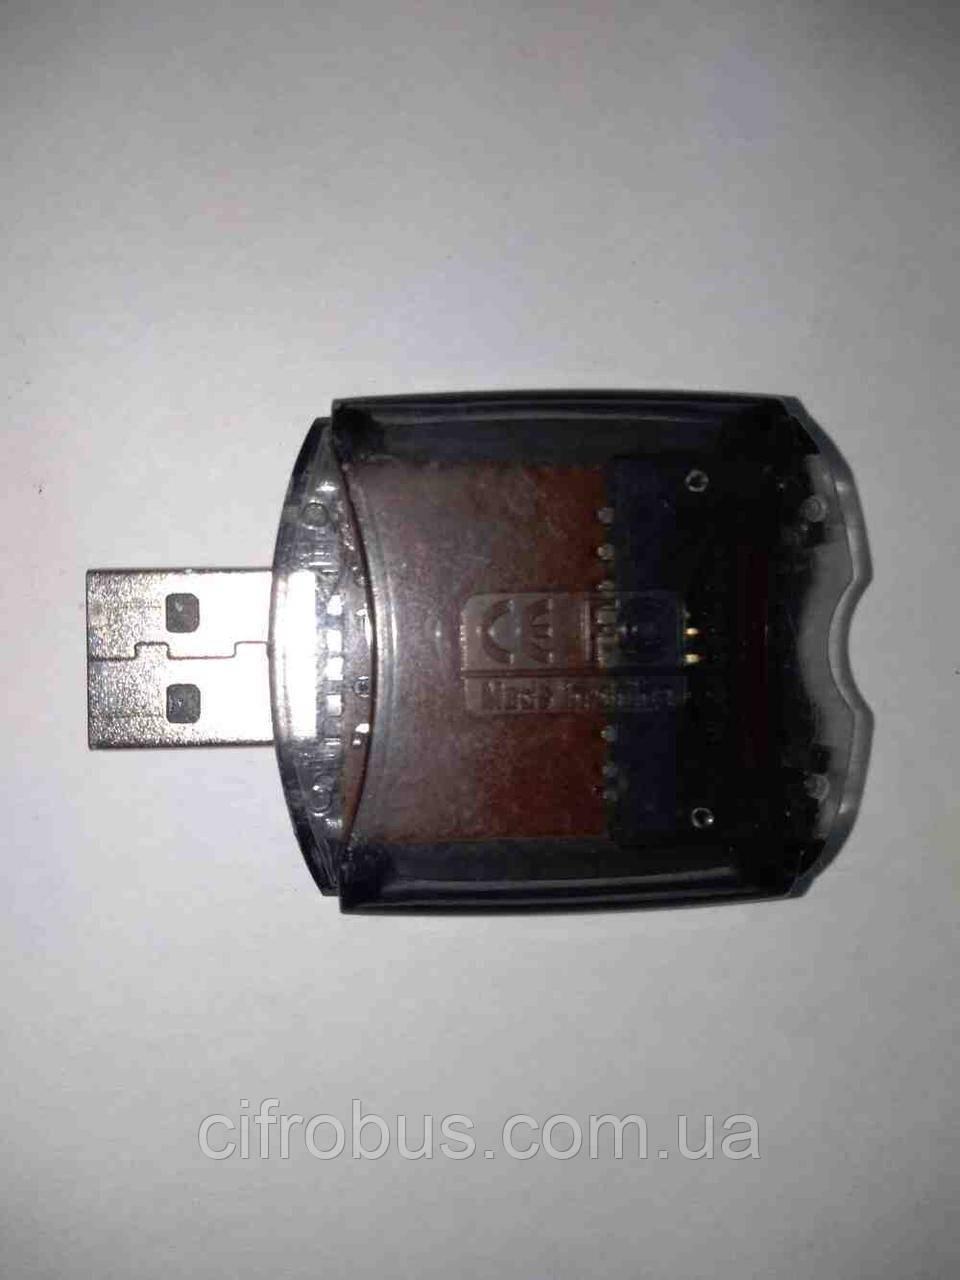 Б/У Card Reader usb MicroSD